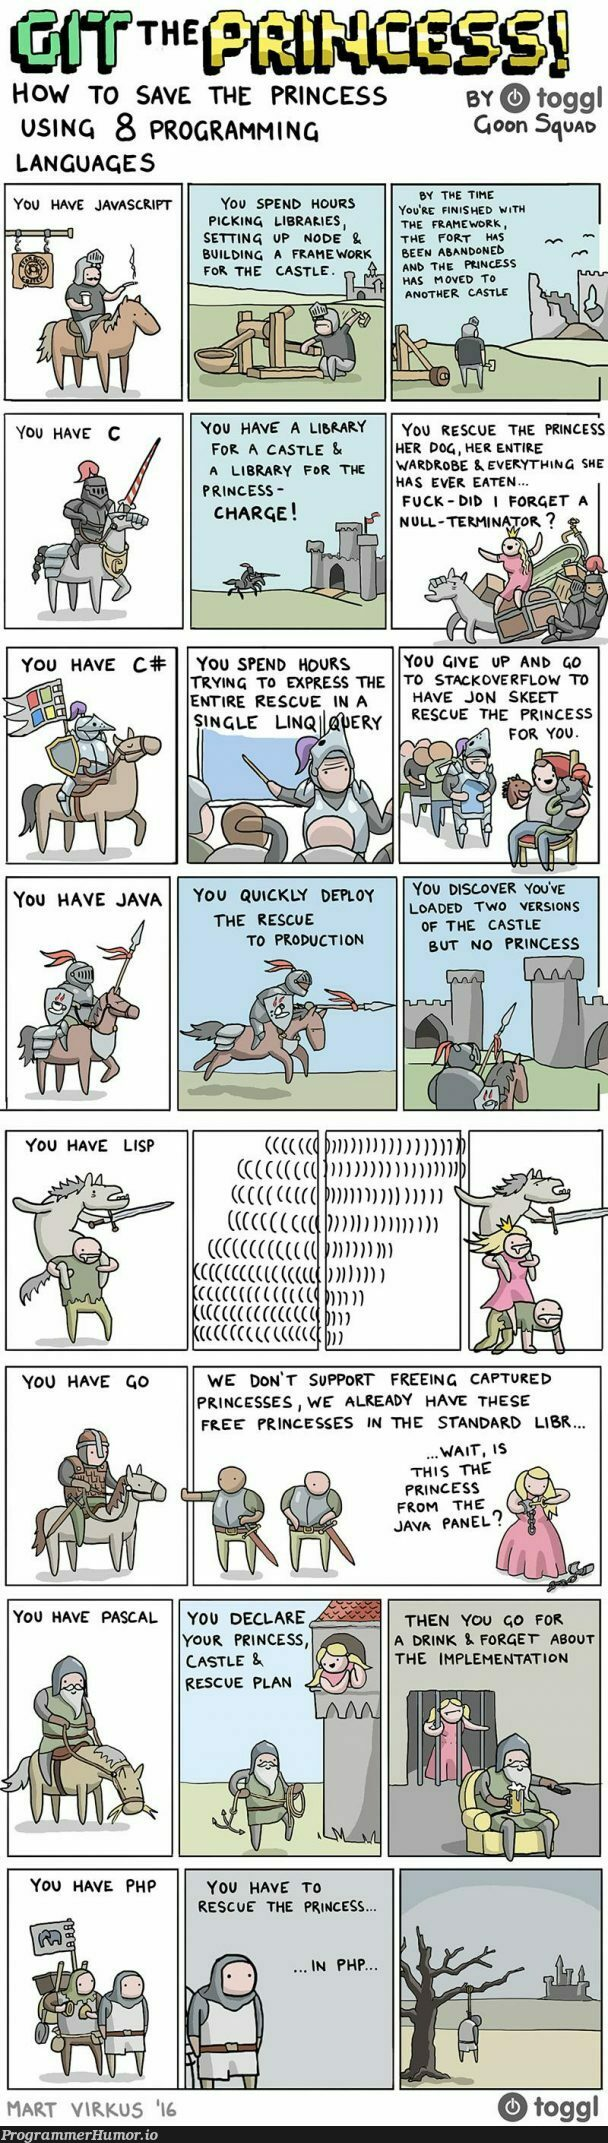 How to save the princess using 8 programming languages   programming-memes, javascript-memes, java-memes, program-memes, node-memes, version-memes, production-memes, language-memes, framework-memes, product-memes, programming language-memes   ProgrammerHumor.io